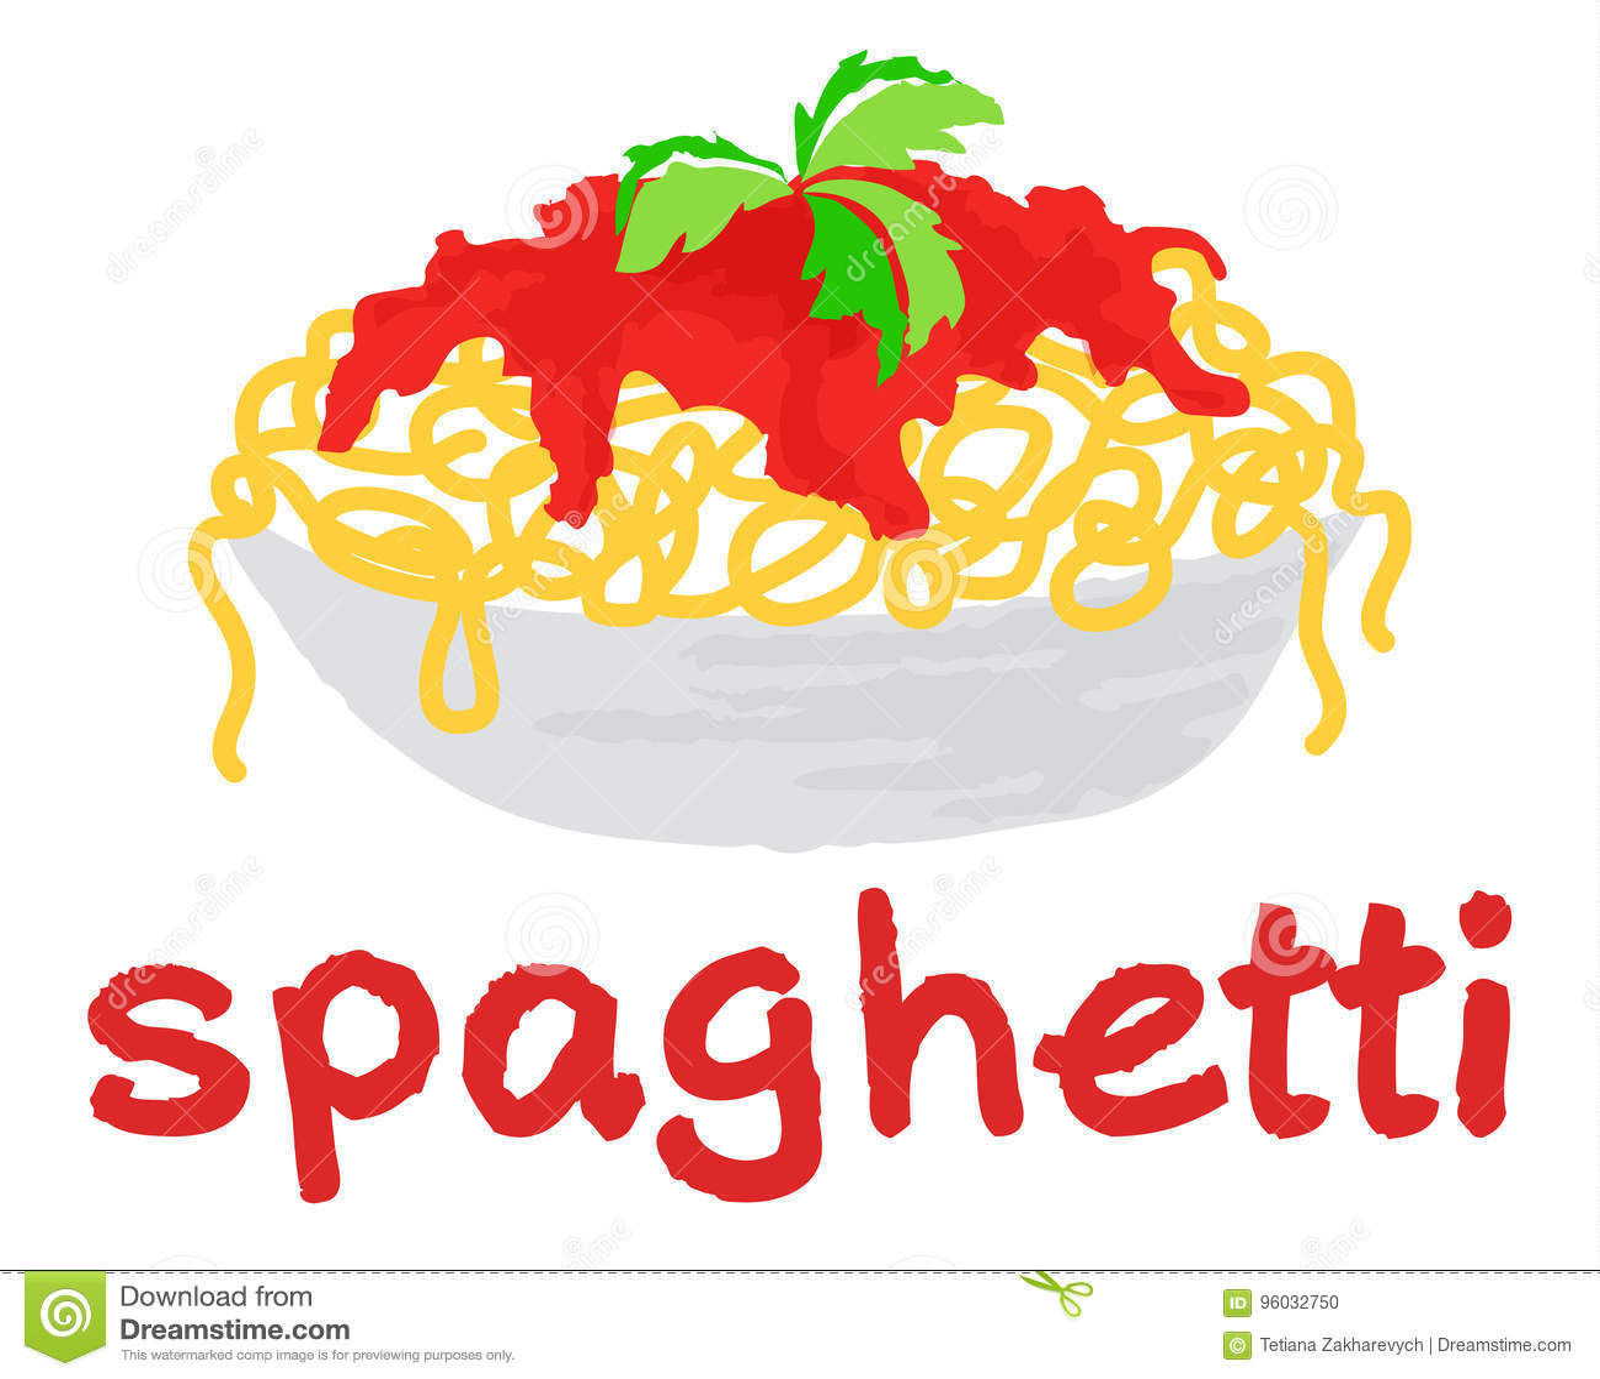 Spaghetti majcher